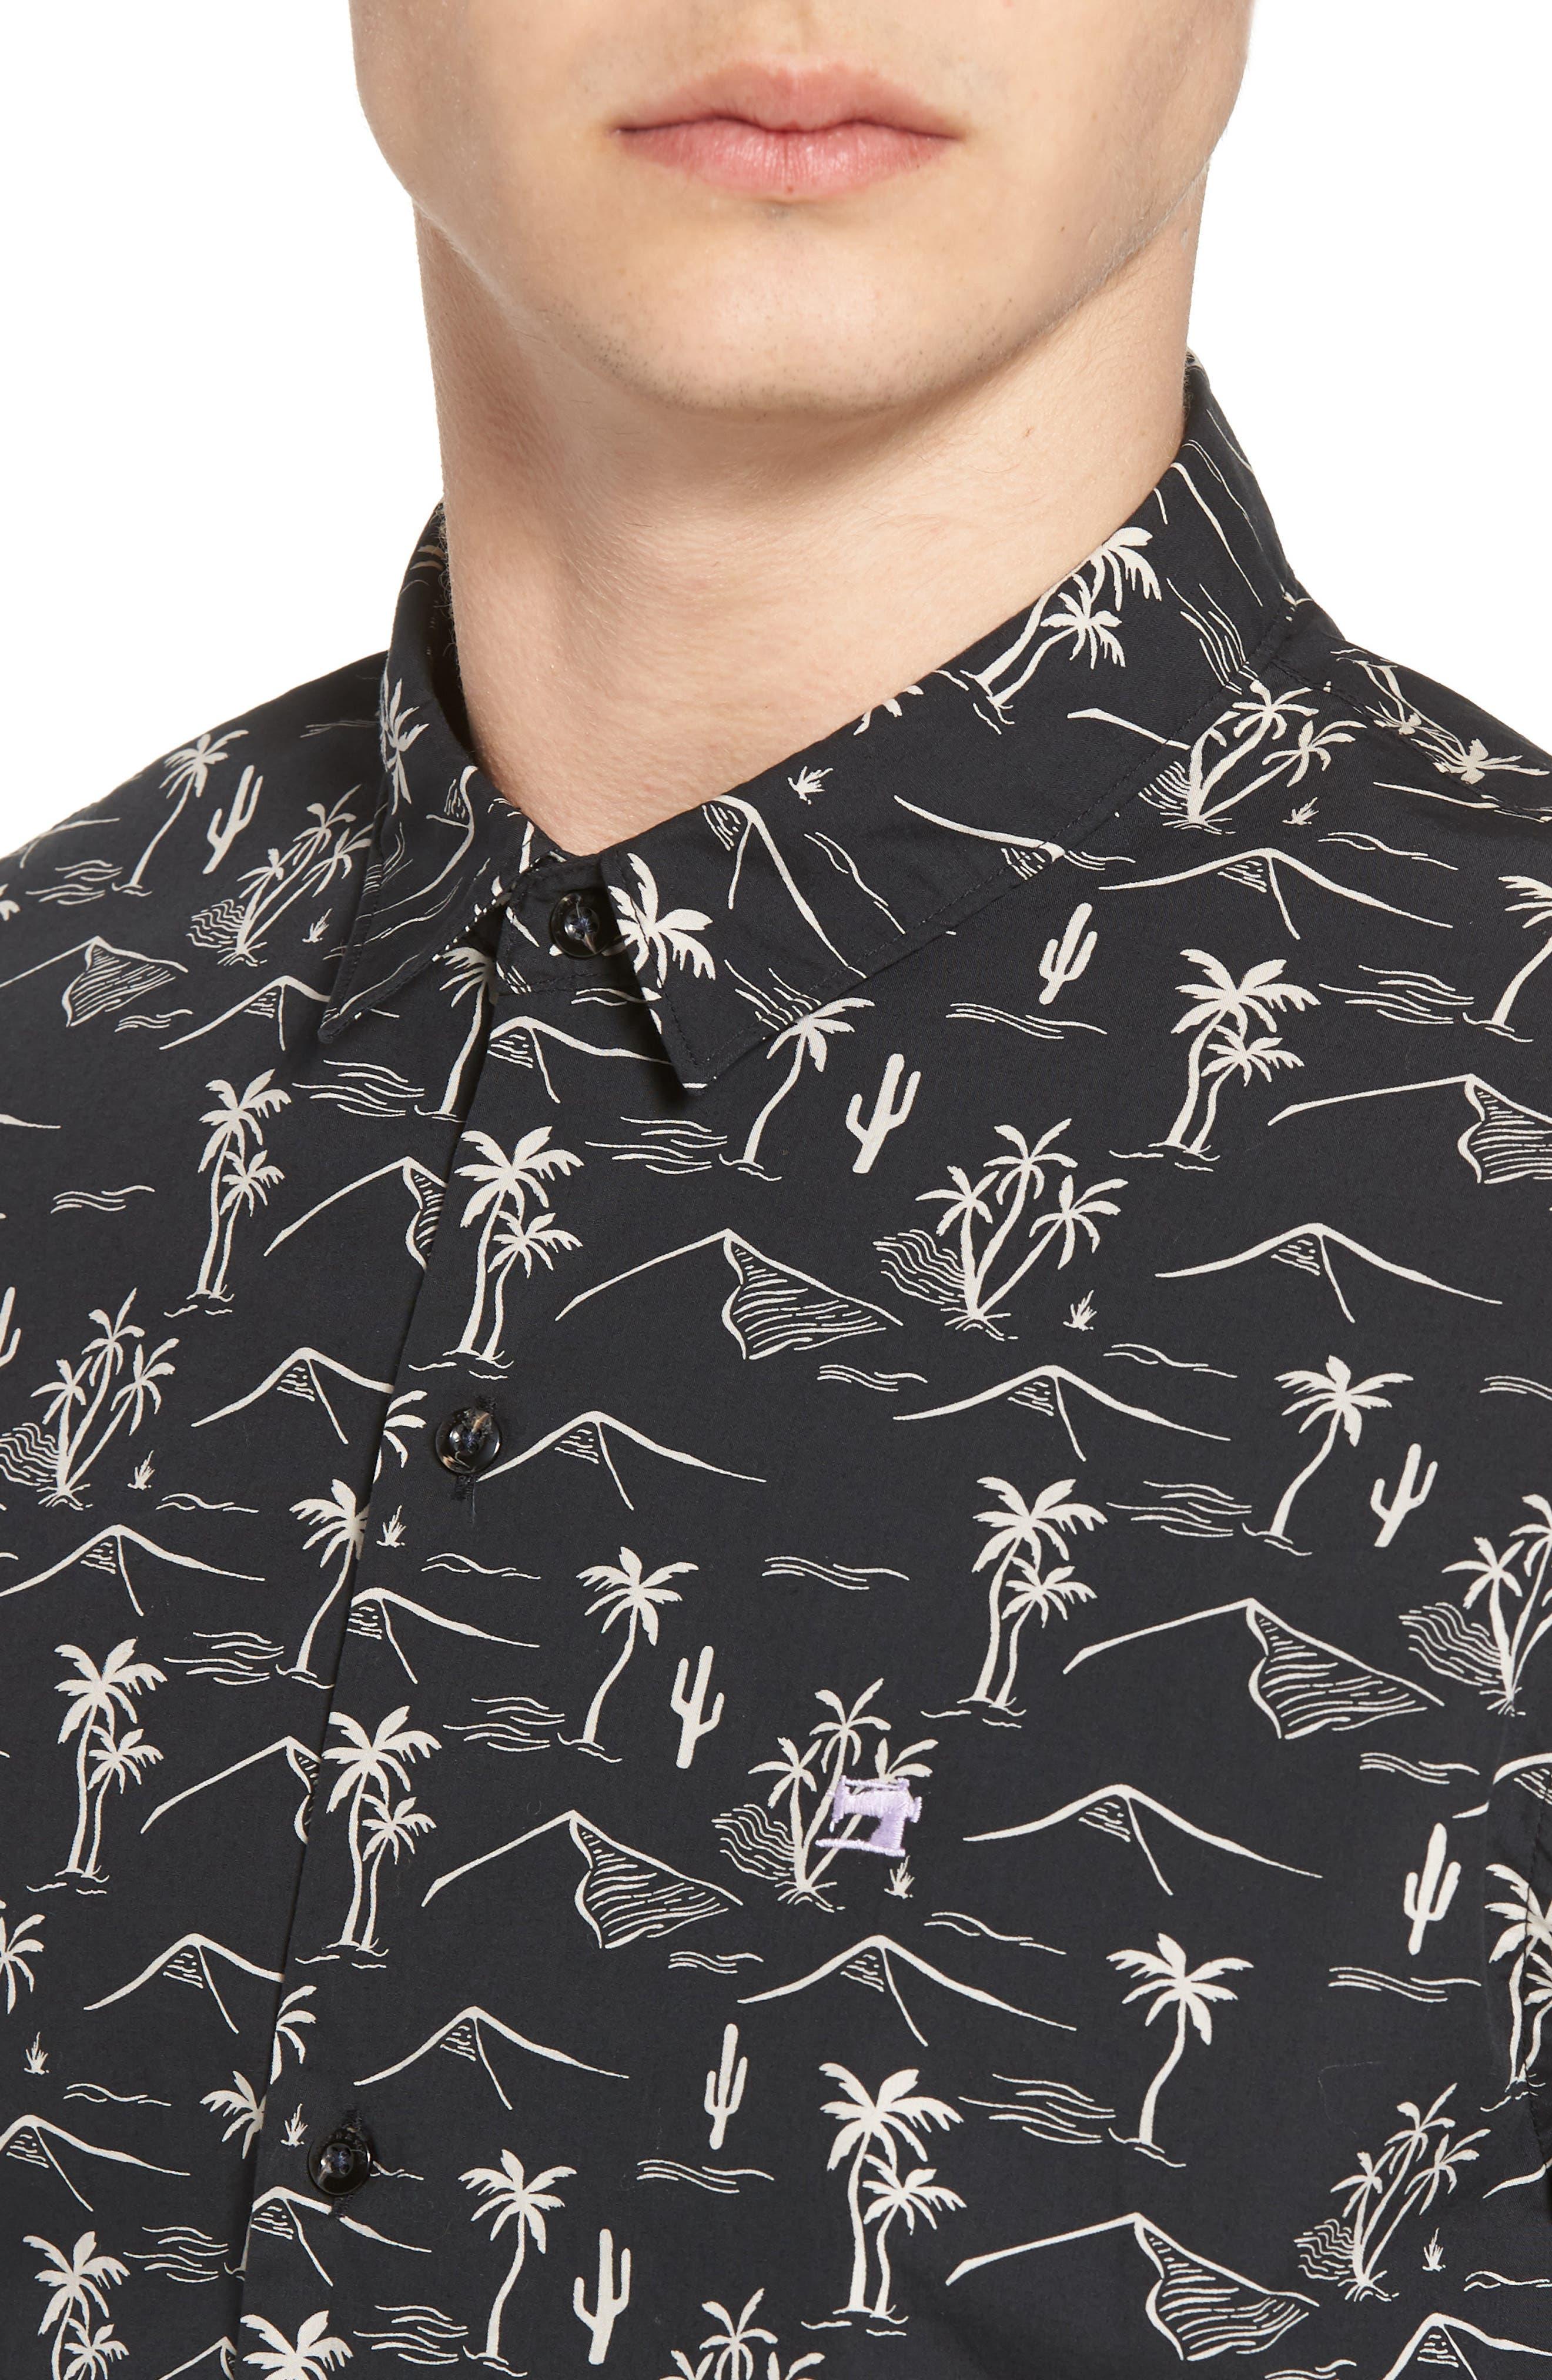 Poolside Woven Shirt,                             Alternate thumbnail 4, color,                             COMBO C